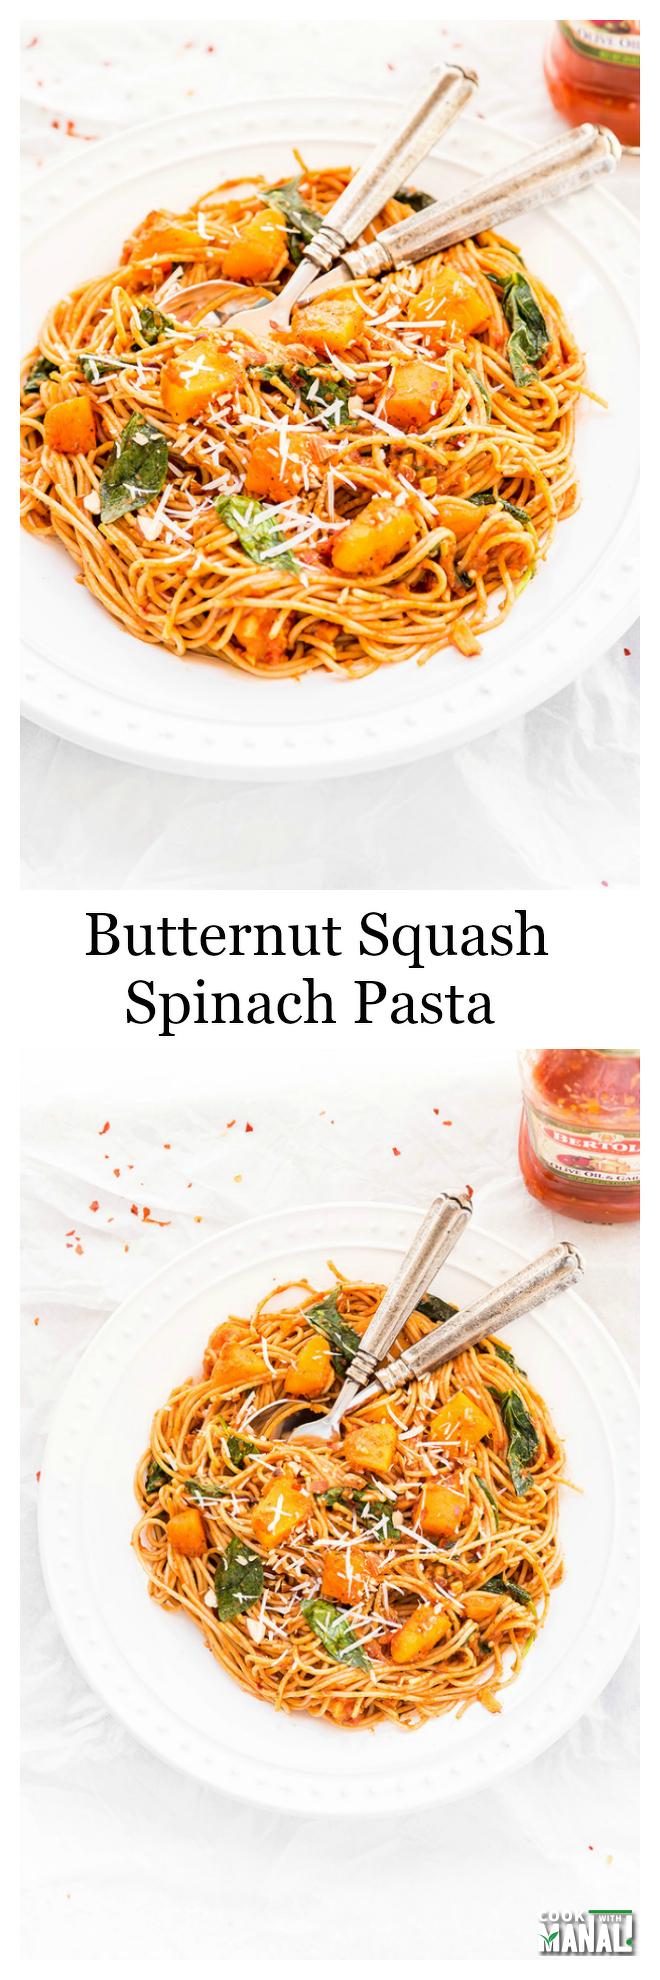 butternut-squash-spinach-pasta-collage